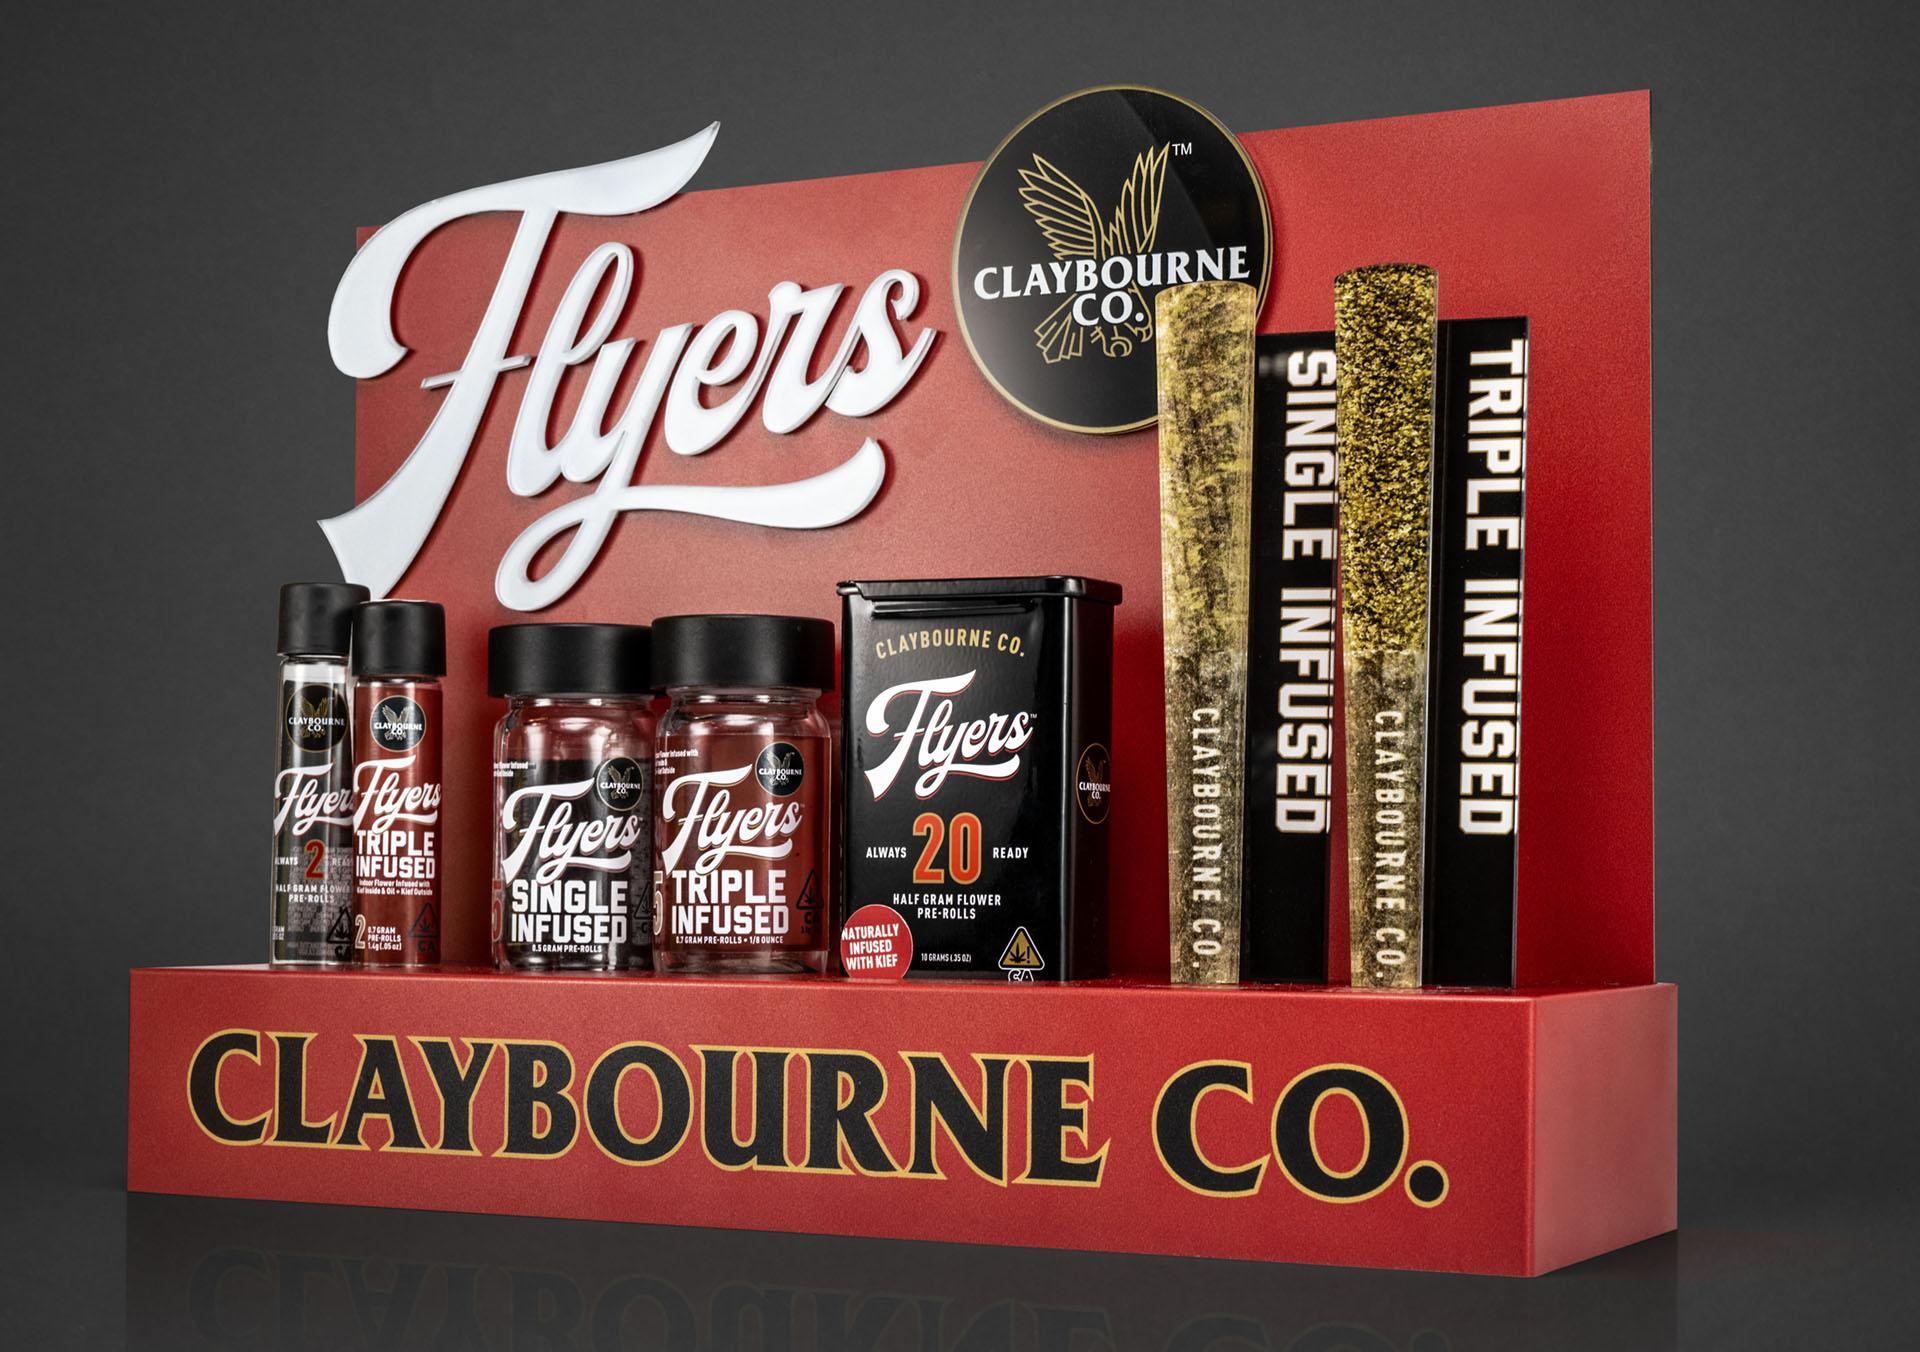 Claybourne Flyers countertop display